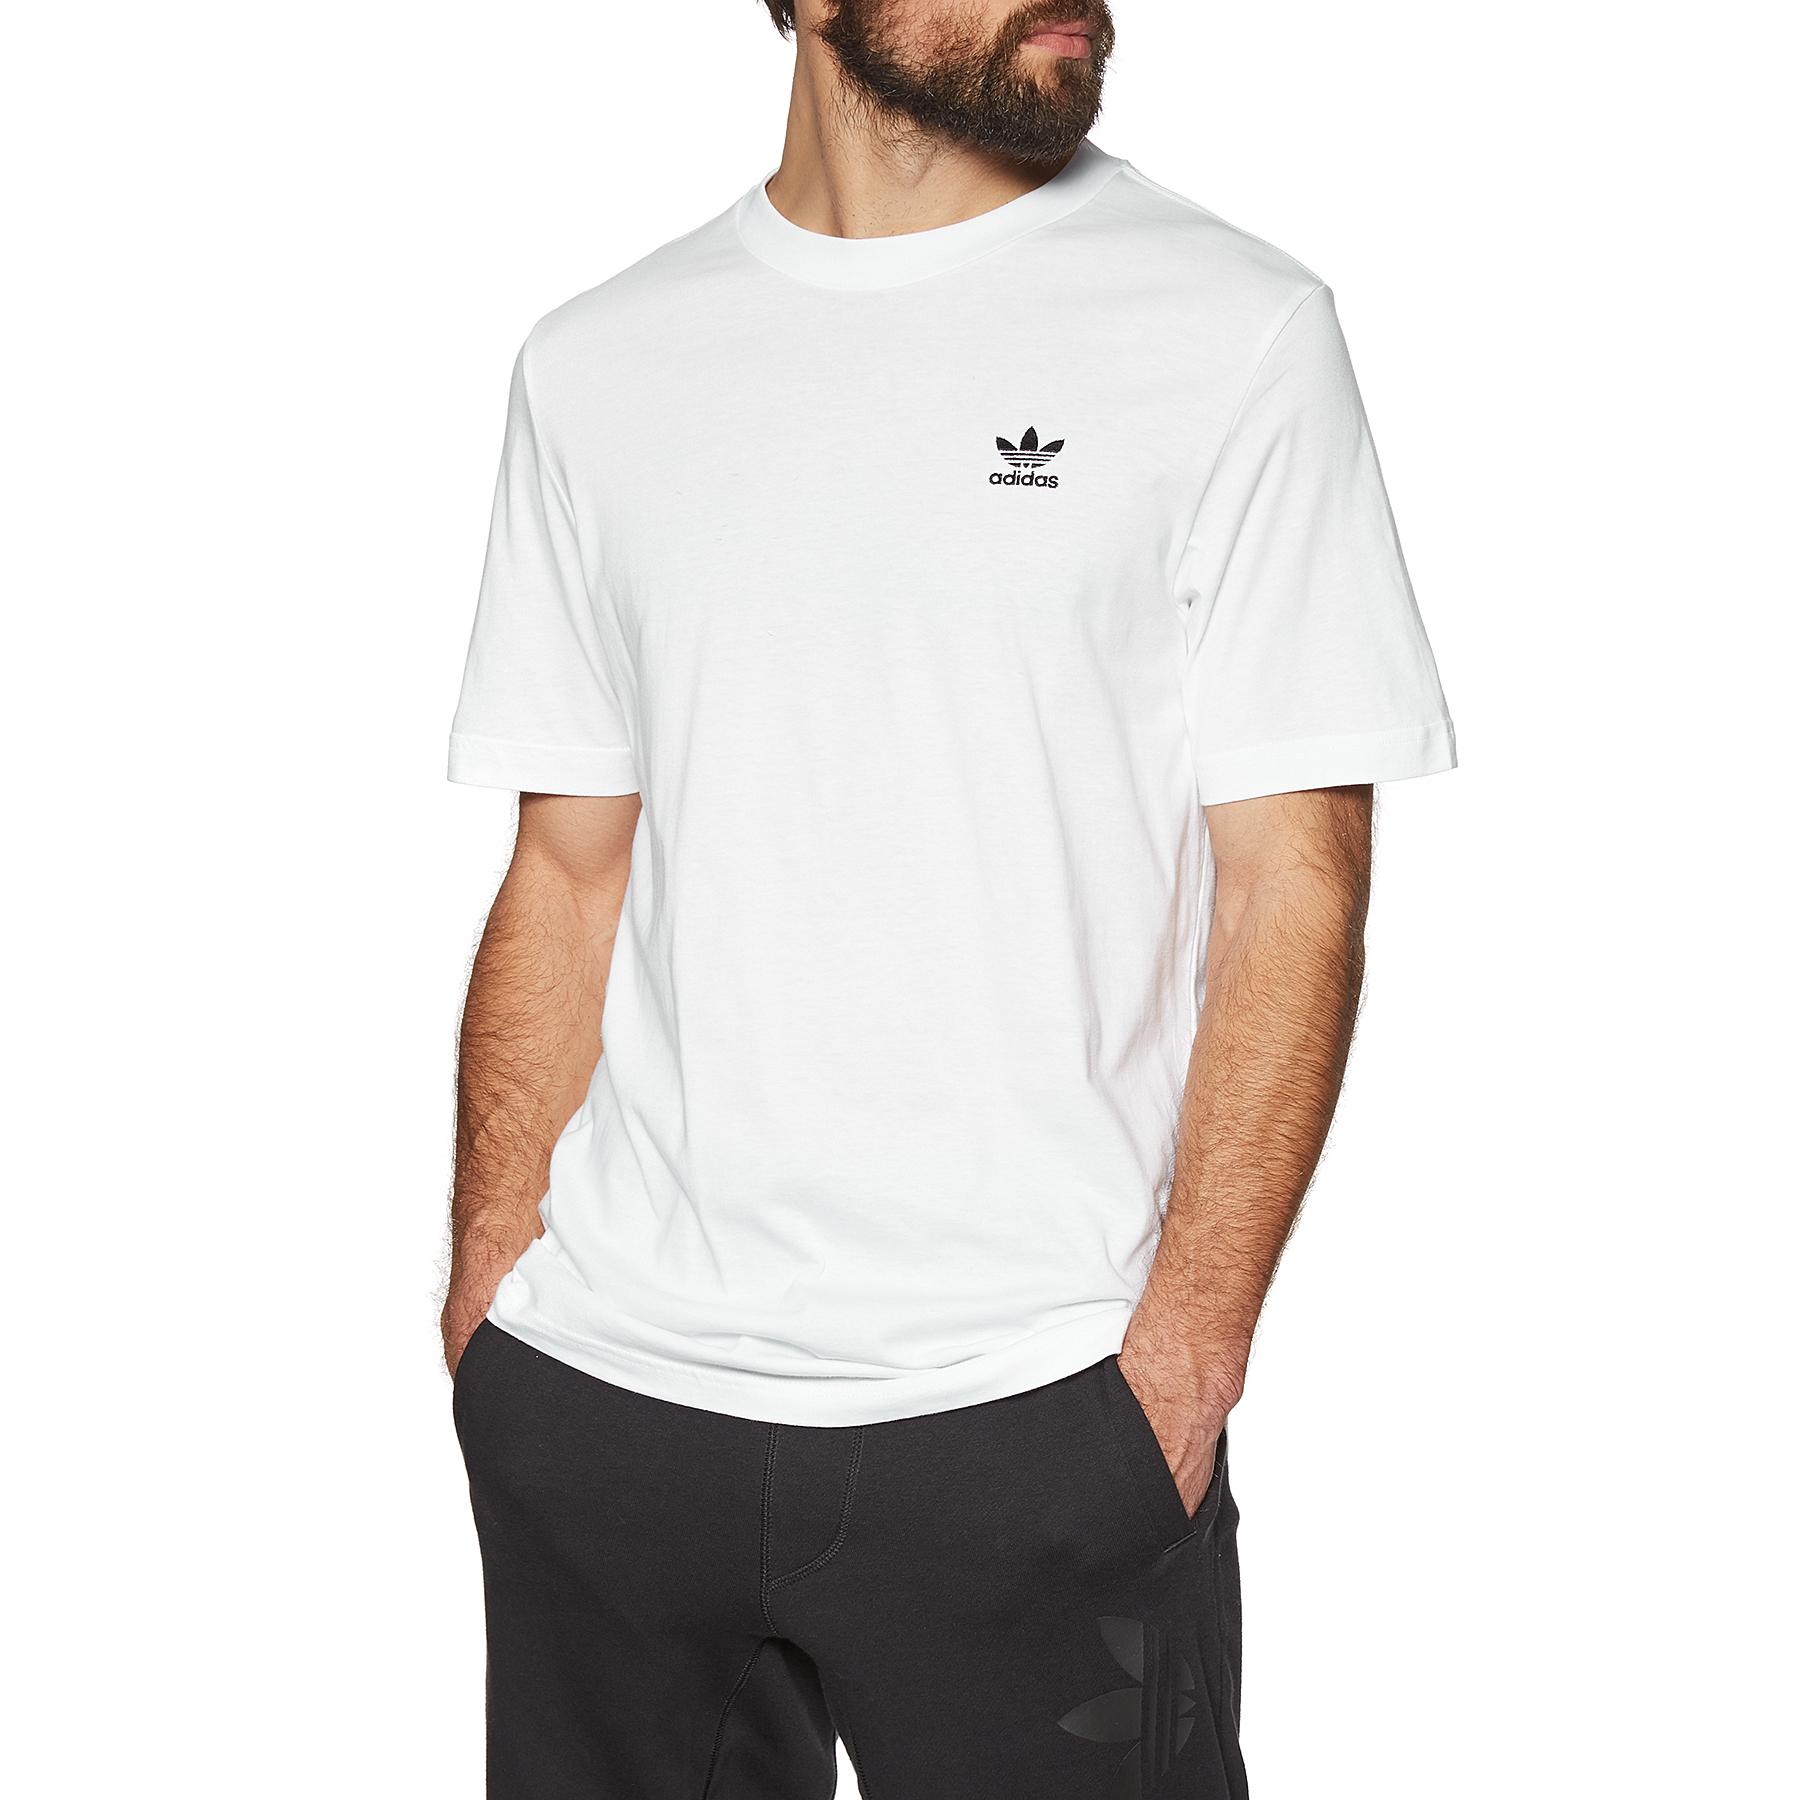 Adidas Thermal Hoodie Originals Outline Legend Marine